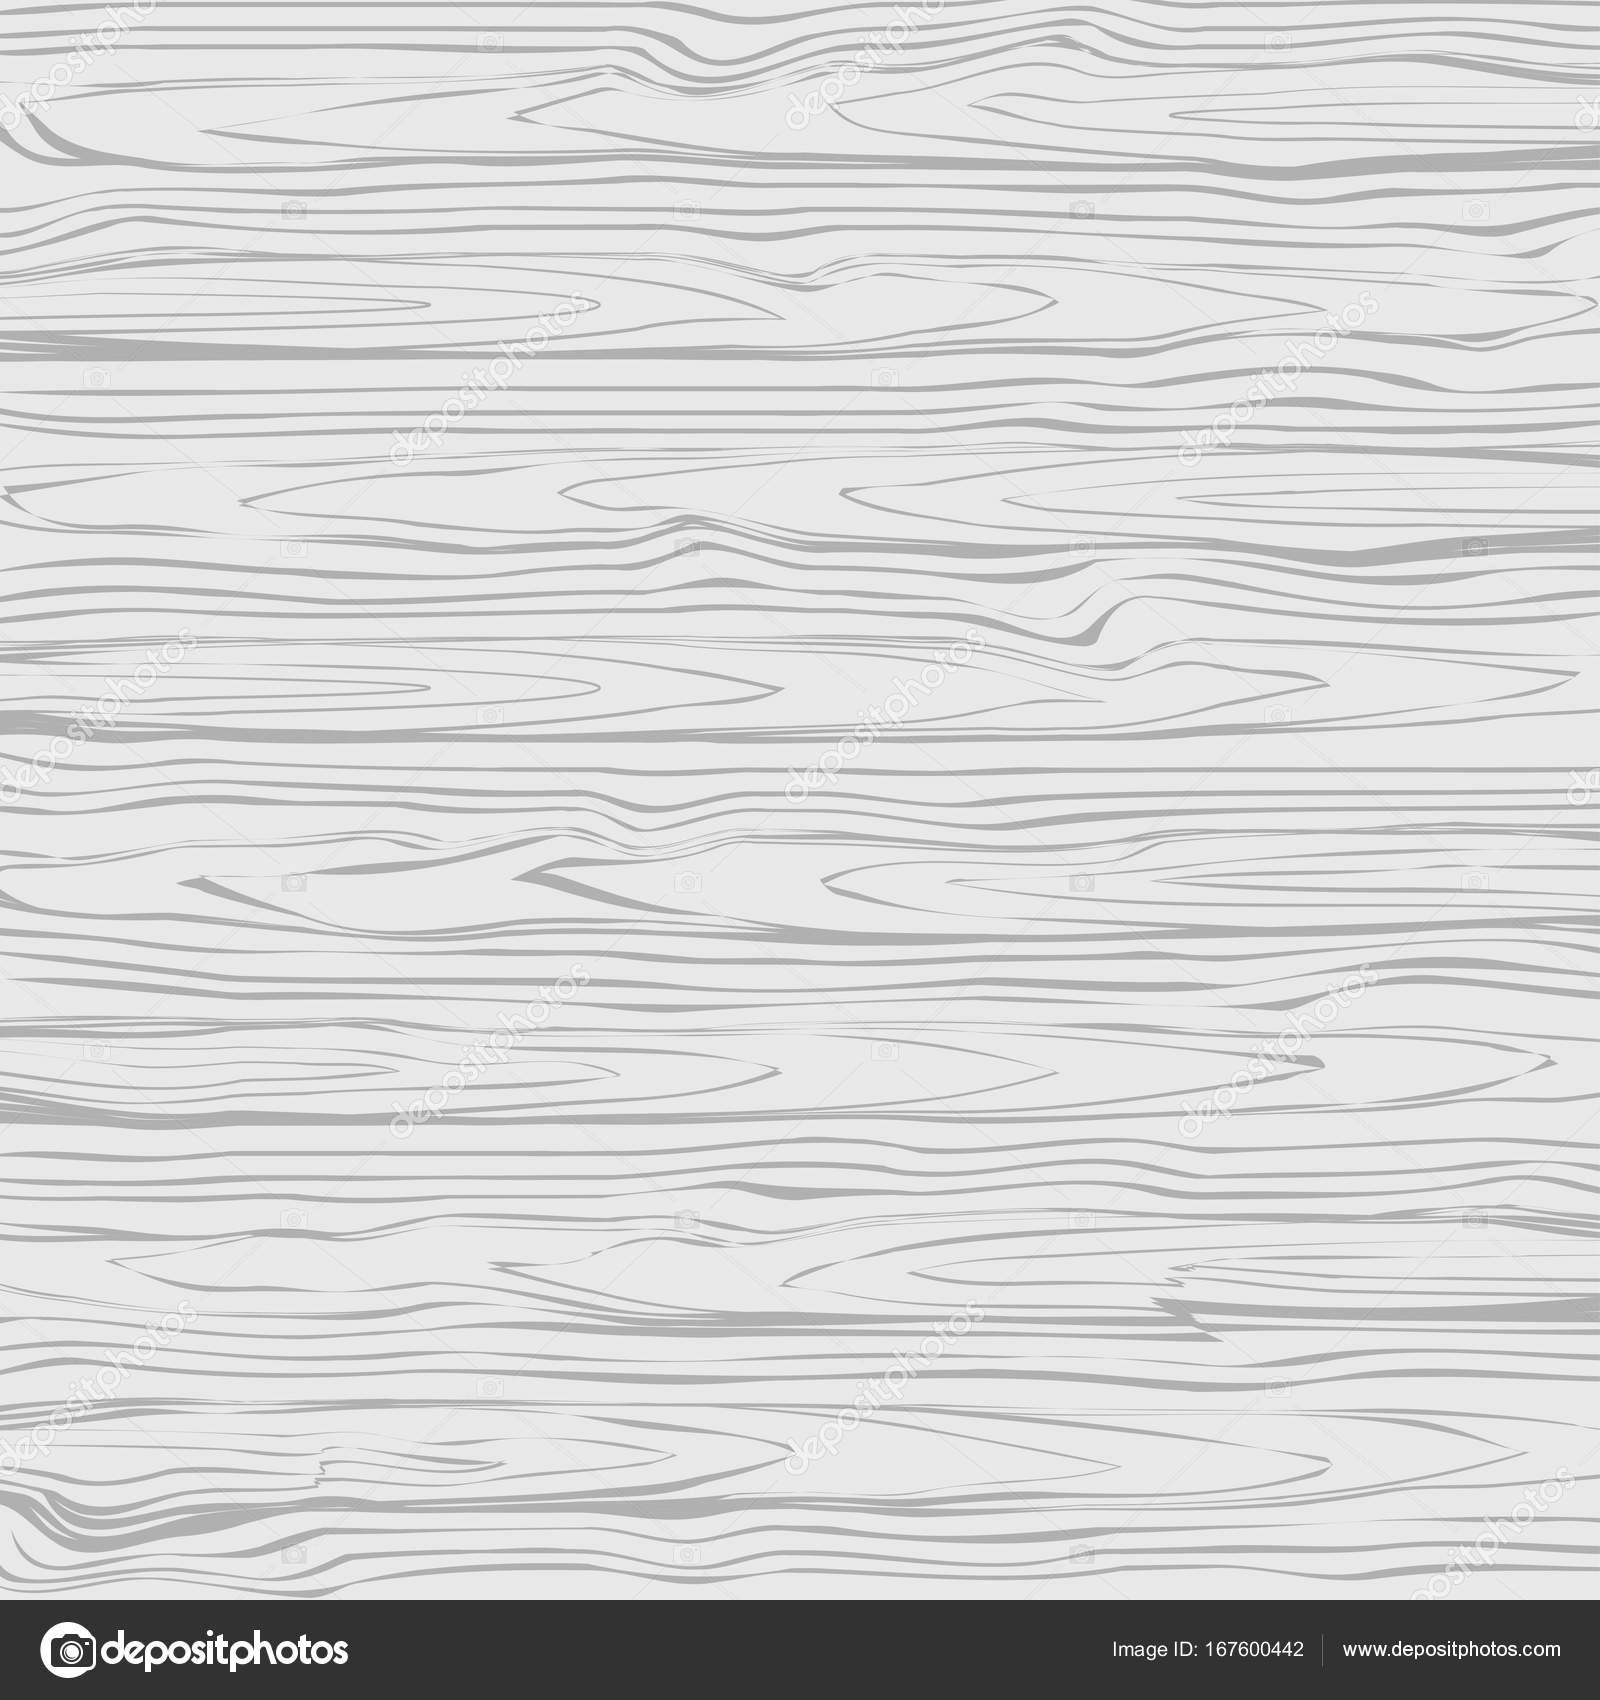 Wood Texture Background Vector Wood Grain Stock Vector C Brigada915 Gmail Com 167600442